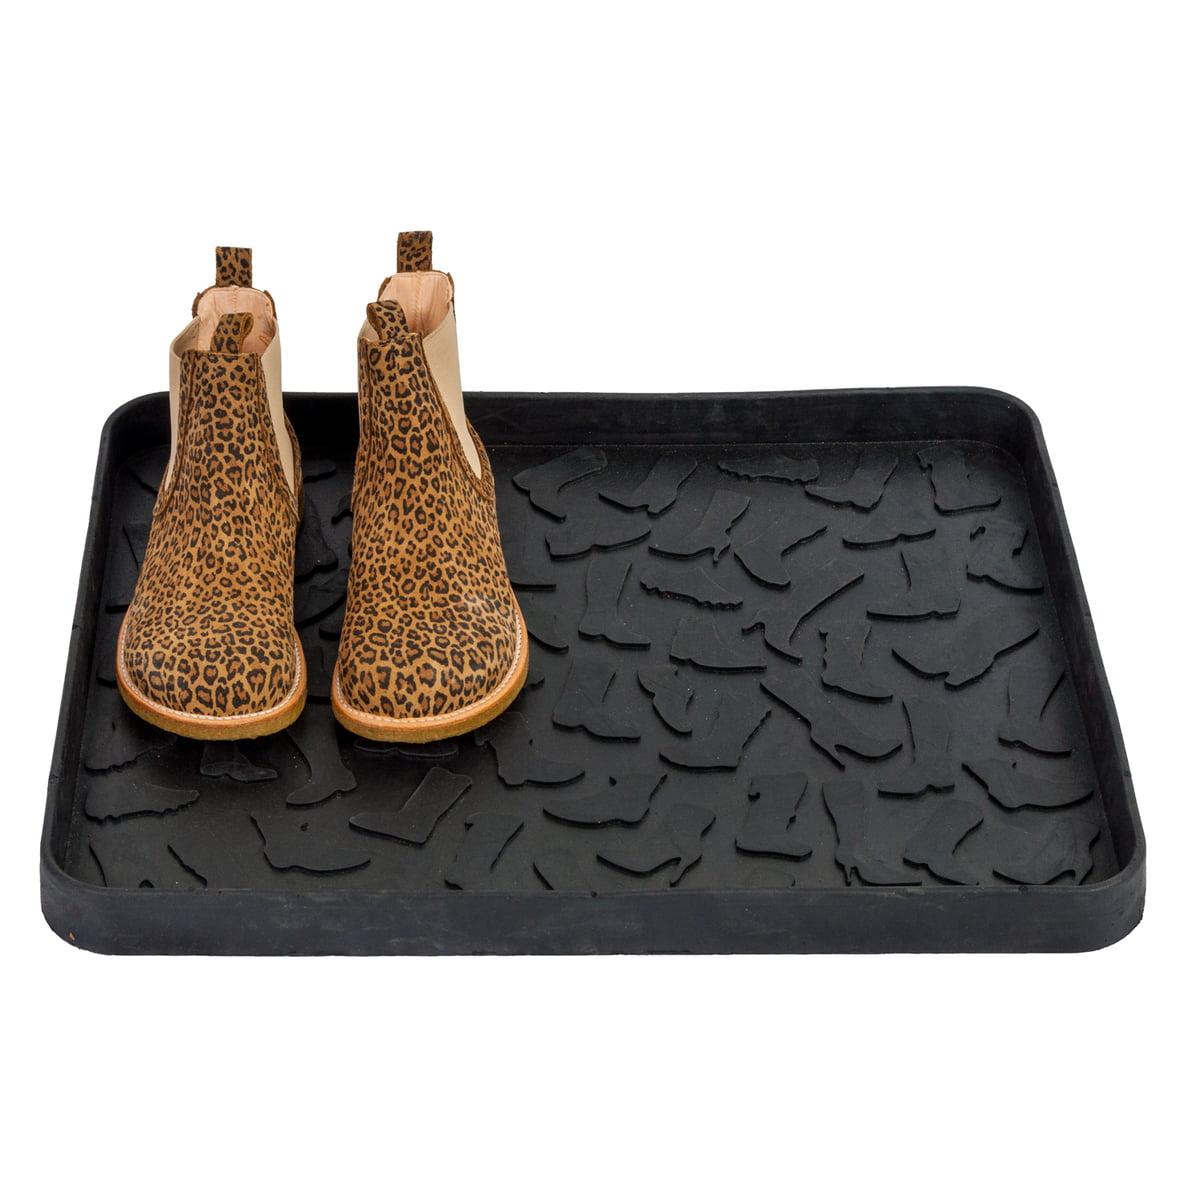 Tica Copenhagen Shoe tray Graphic - M - 48 x 38 cm Z3aVjgPMKw